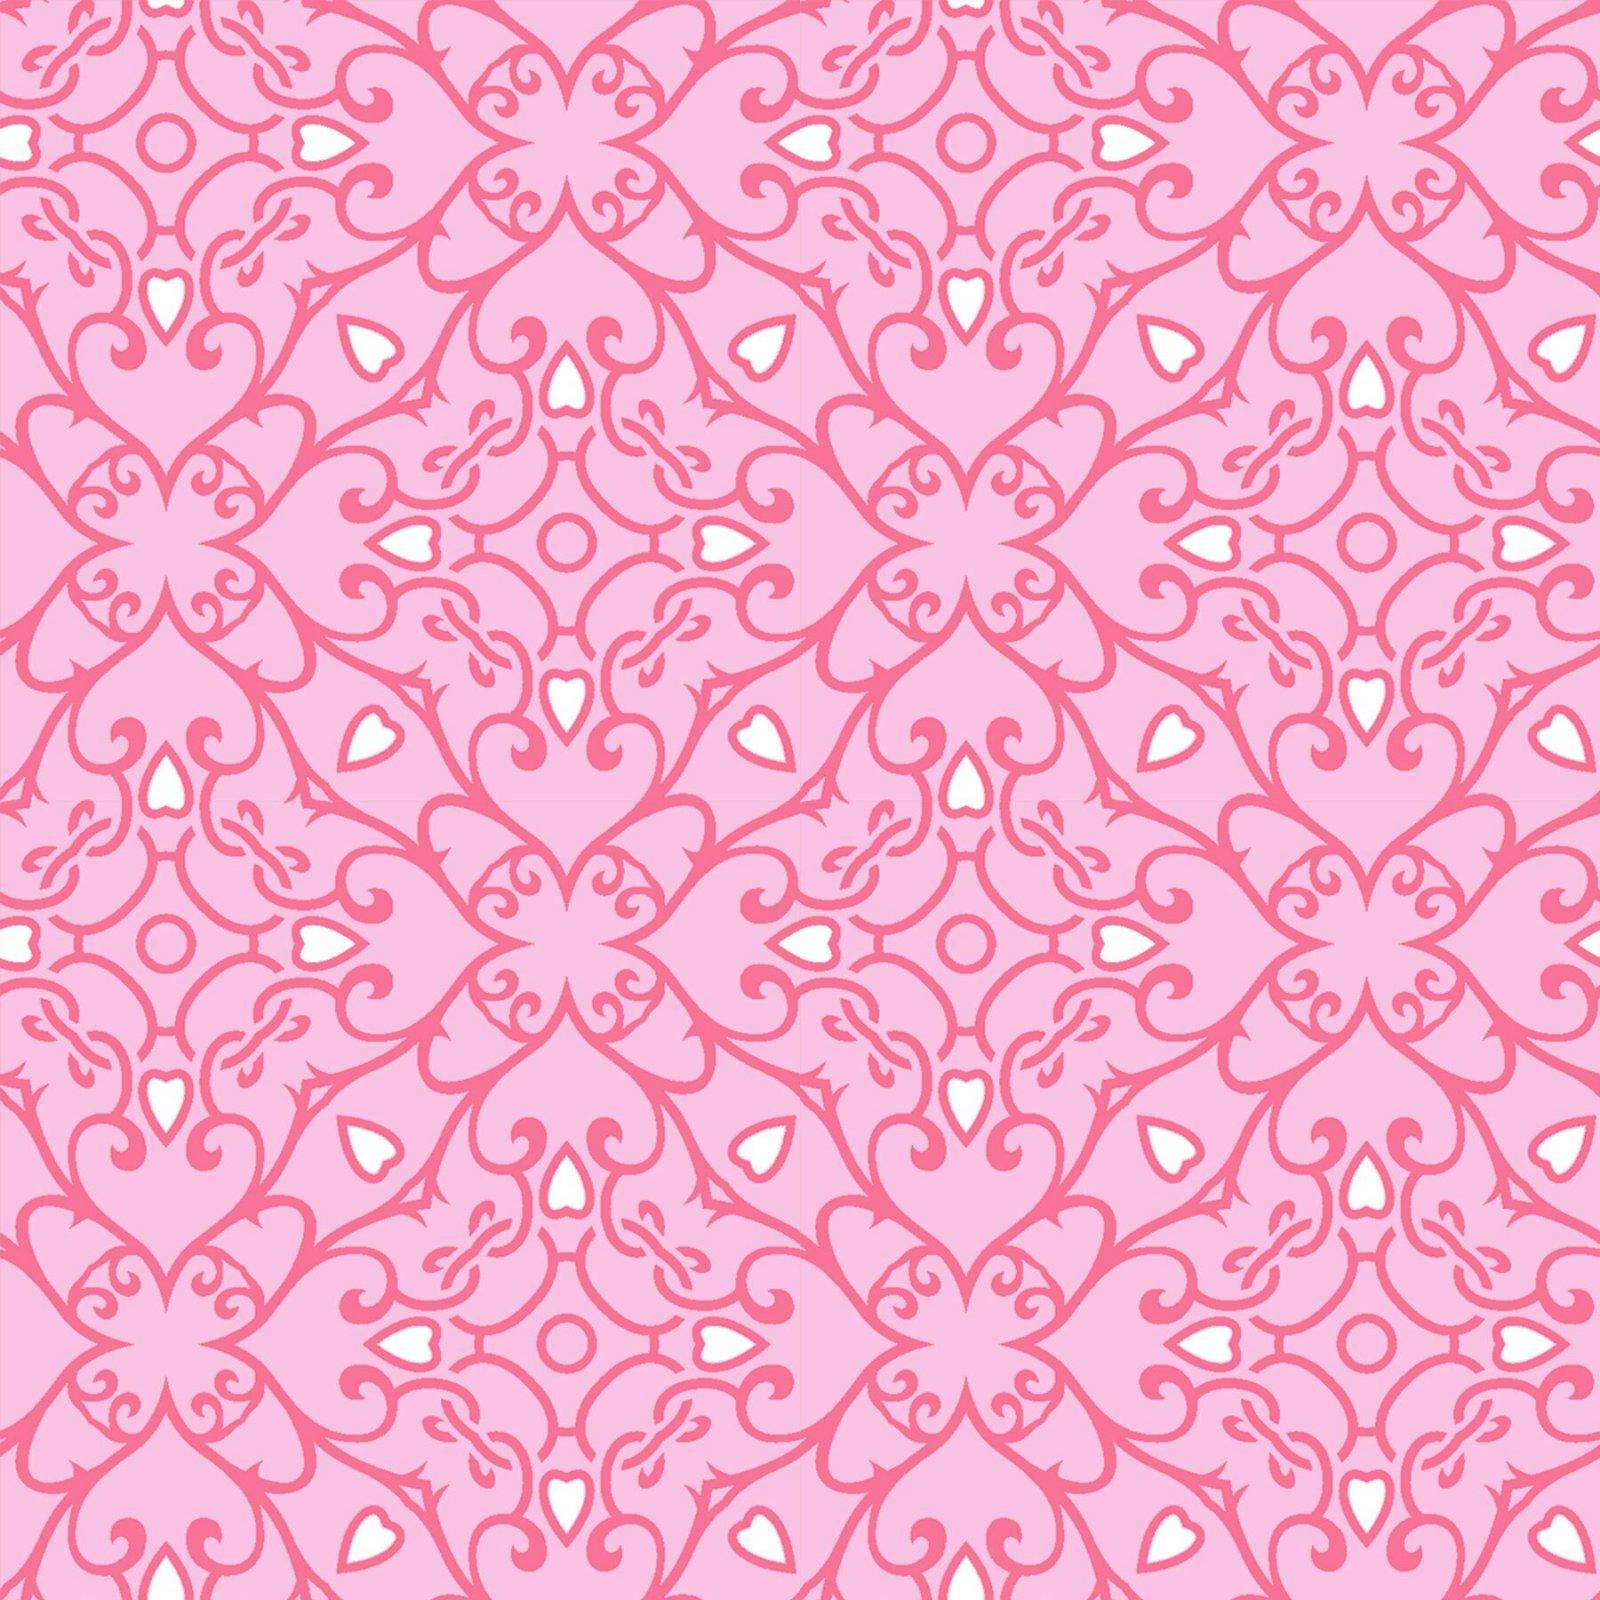 HG-Heart & Soul 9440-22 Pink - Monotone Geometric